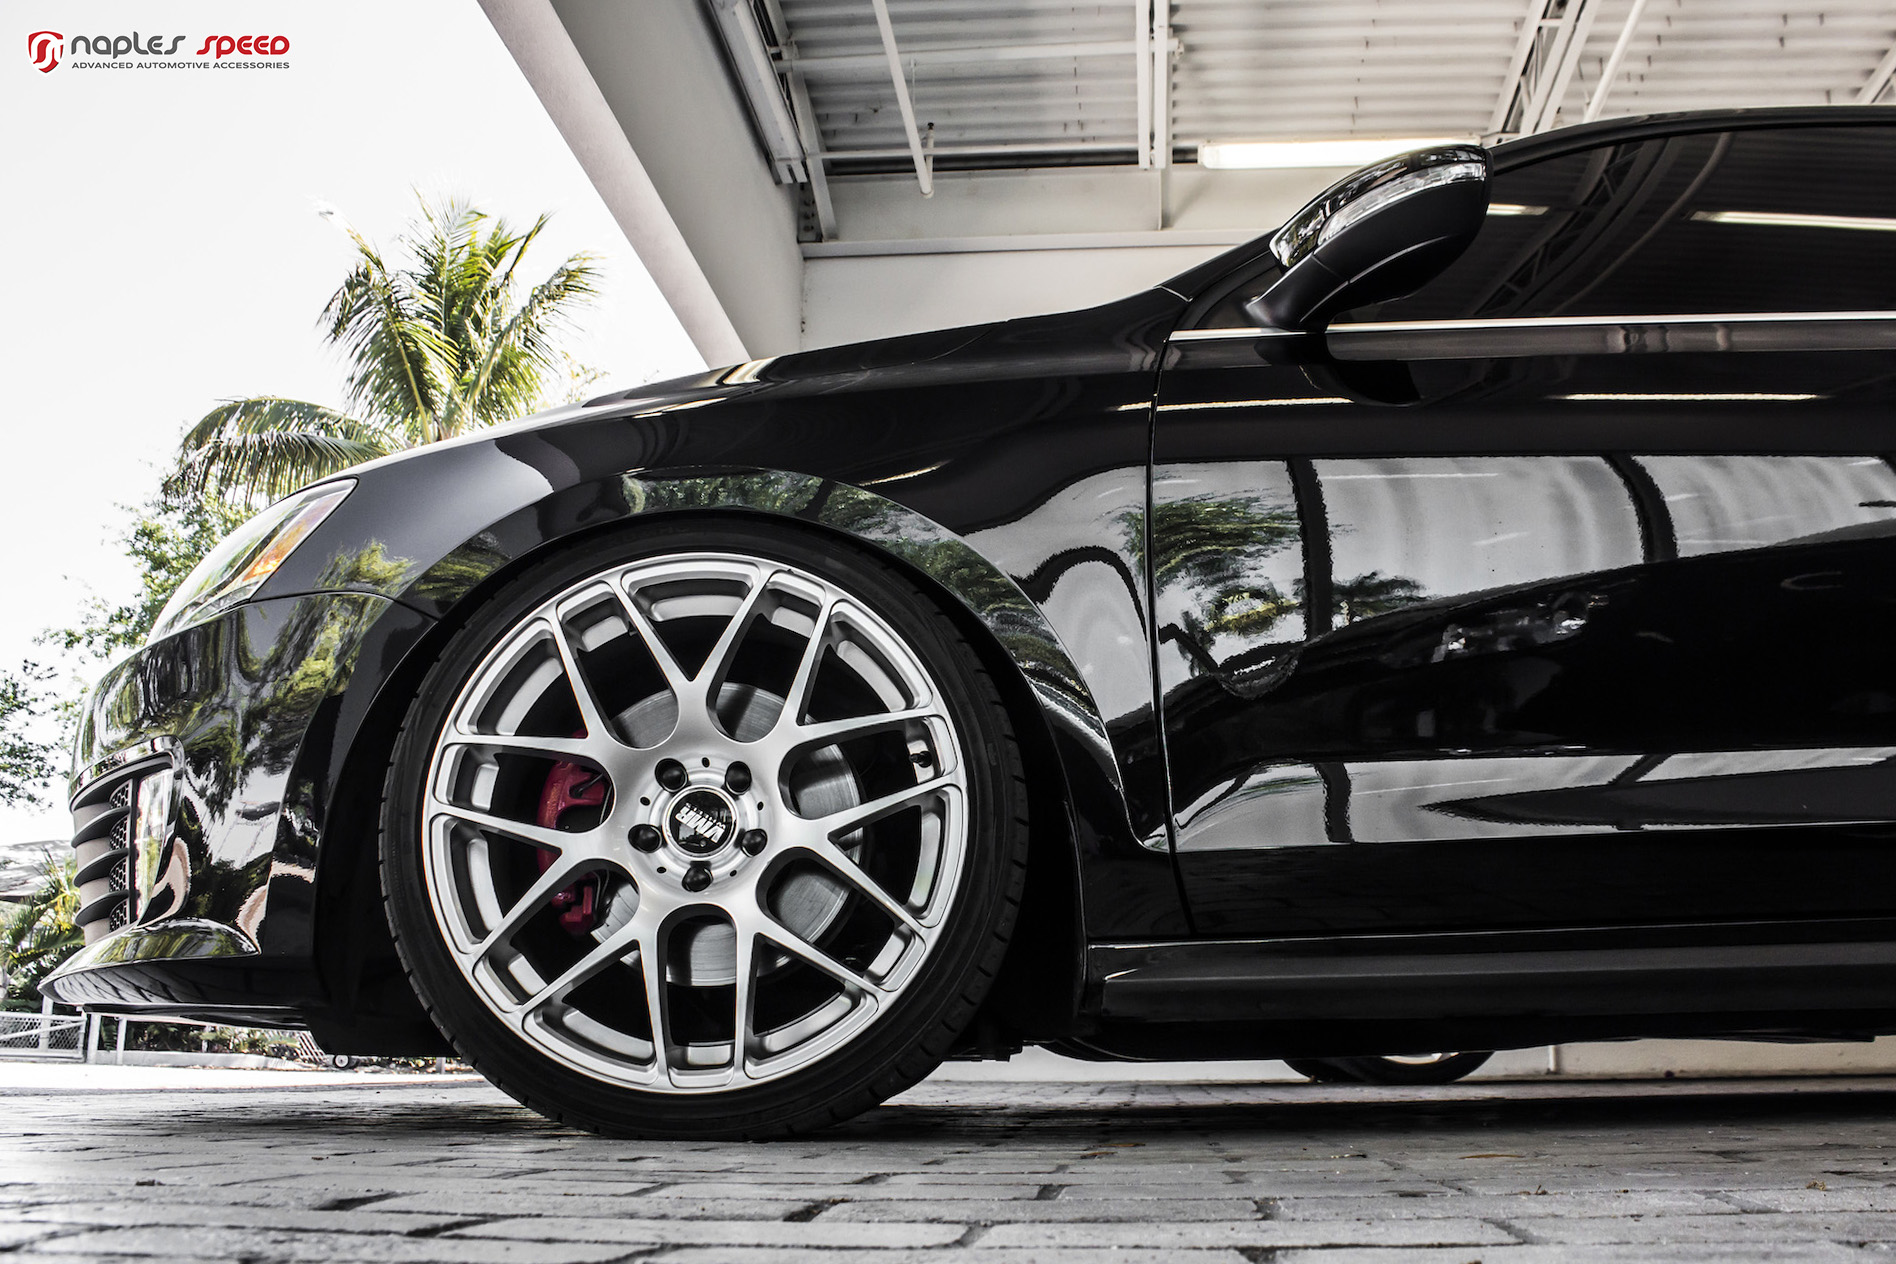 2014 Volkswagen Gli On Vmr 710 Wheels Advanced